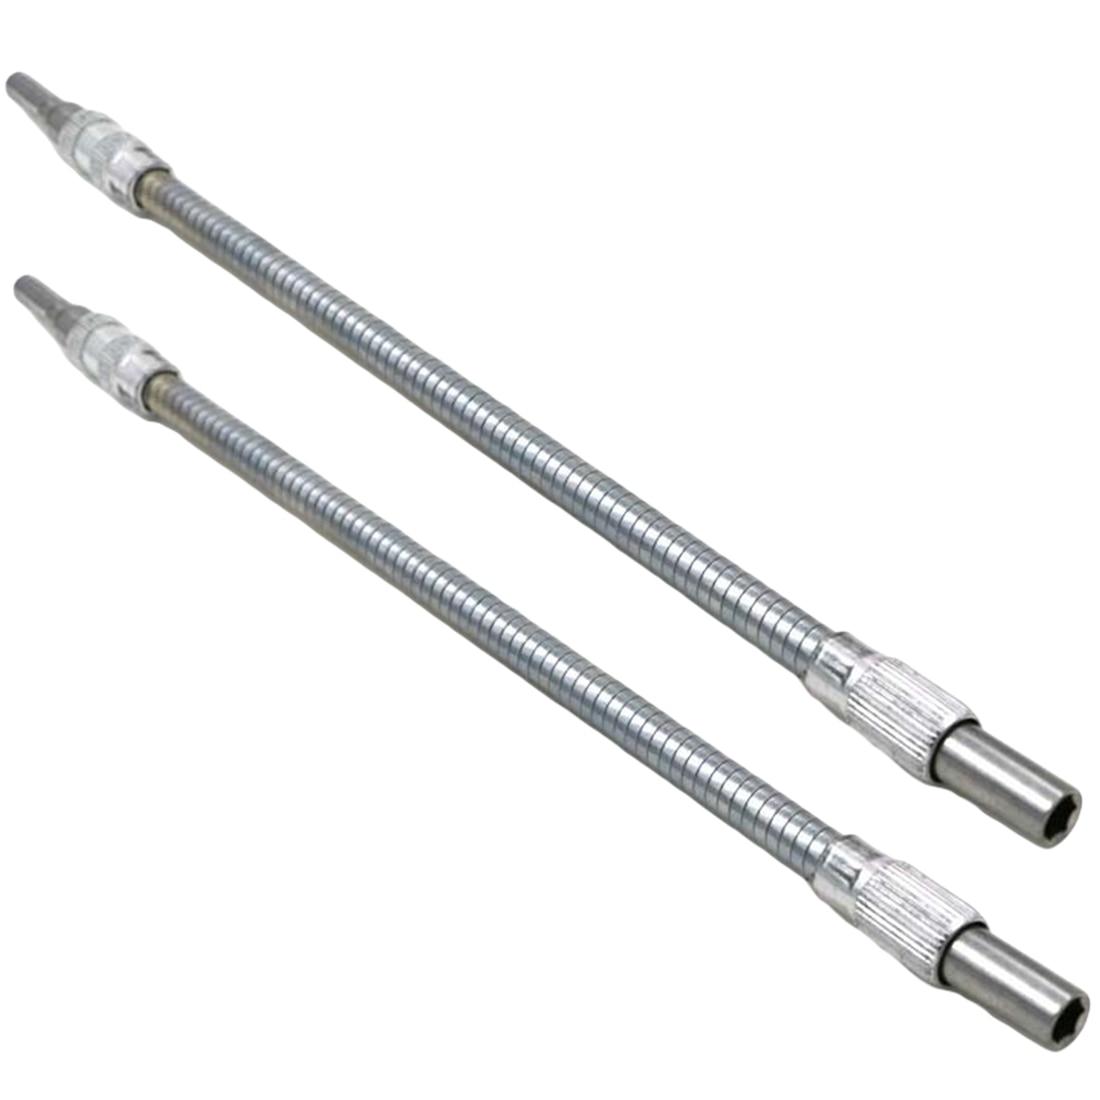 Metal Linear Flexible Shaft Crankshaft Drill Connecting